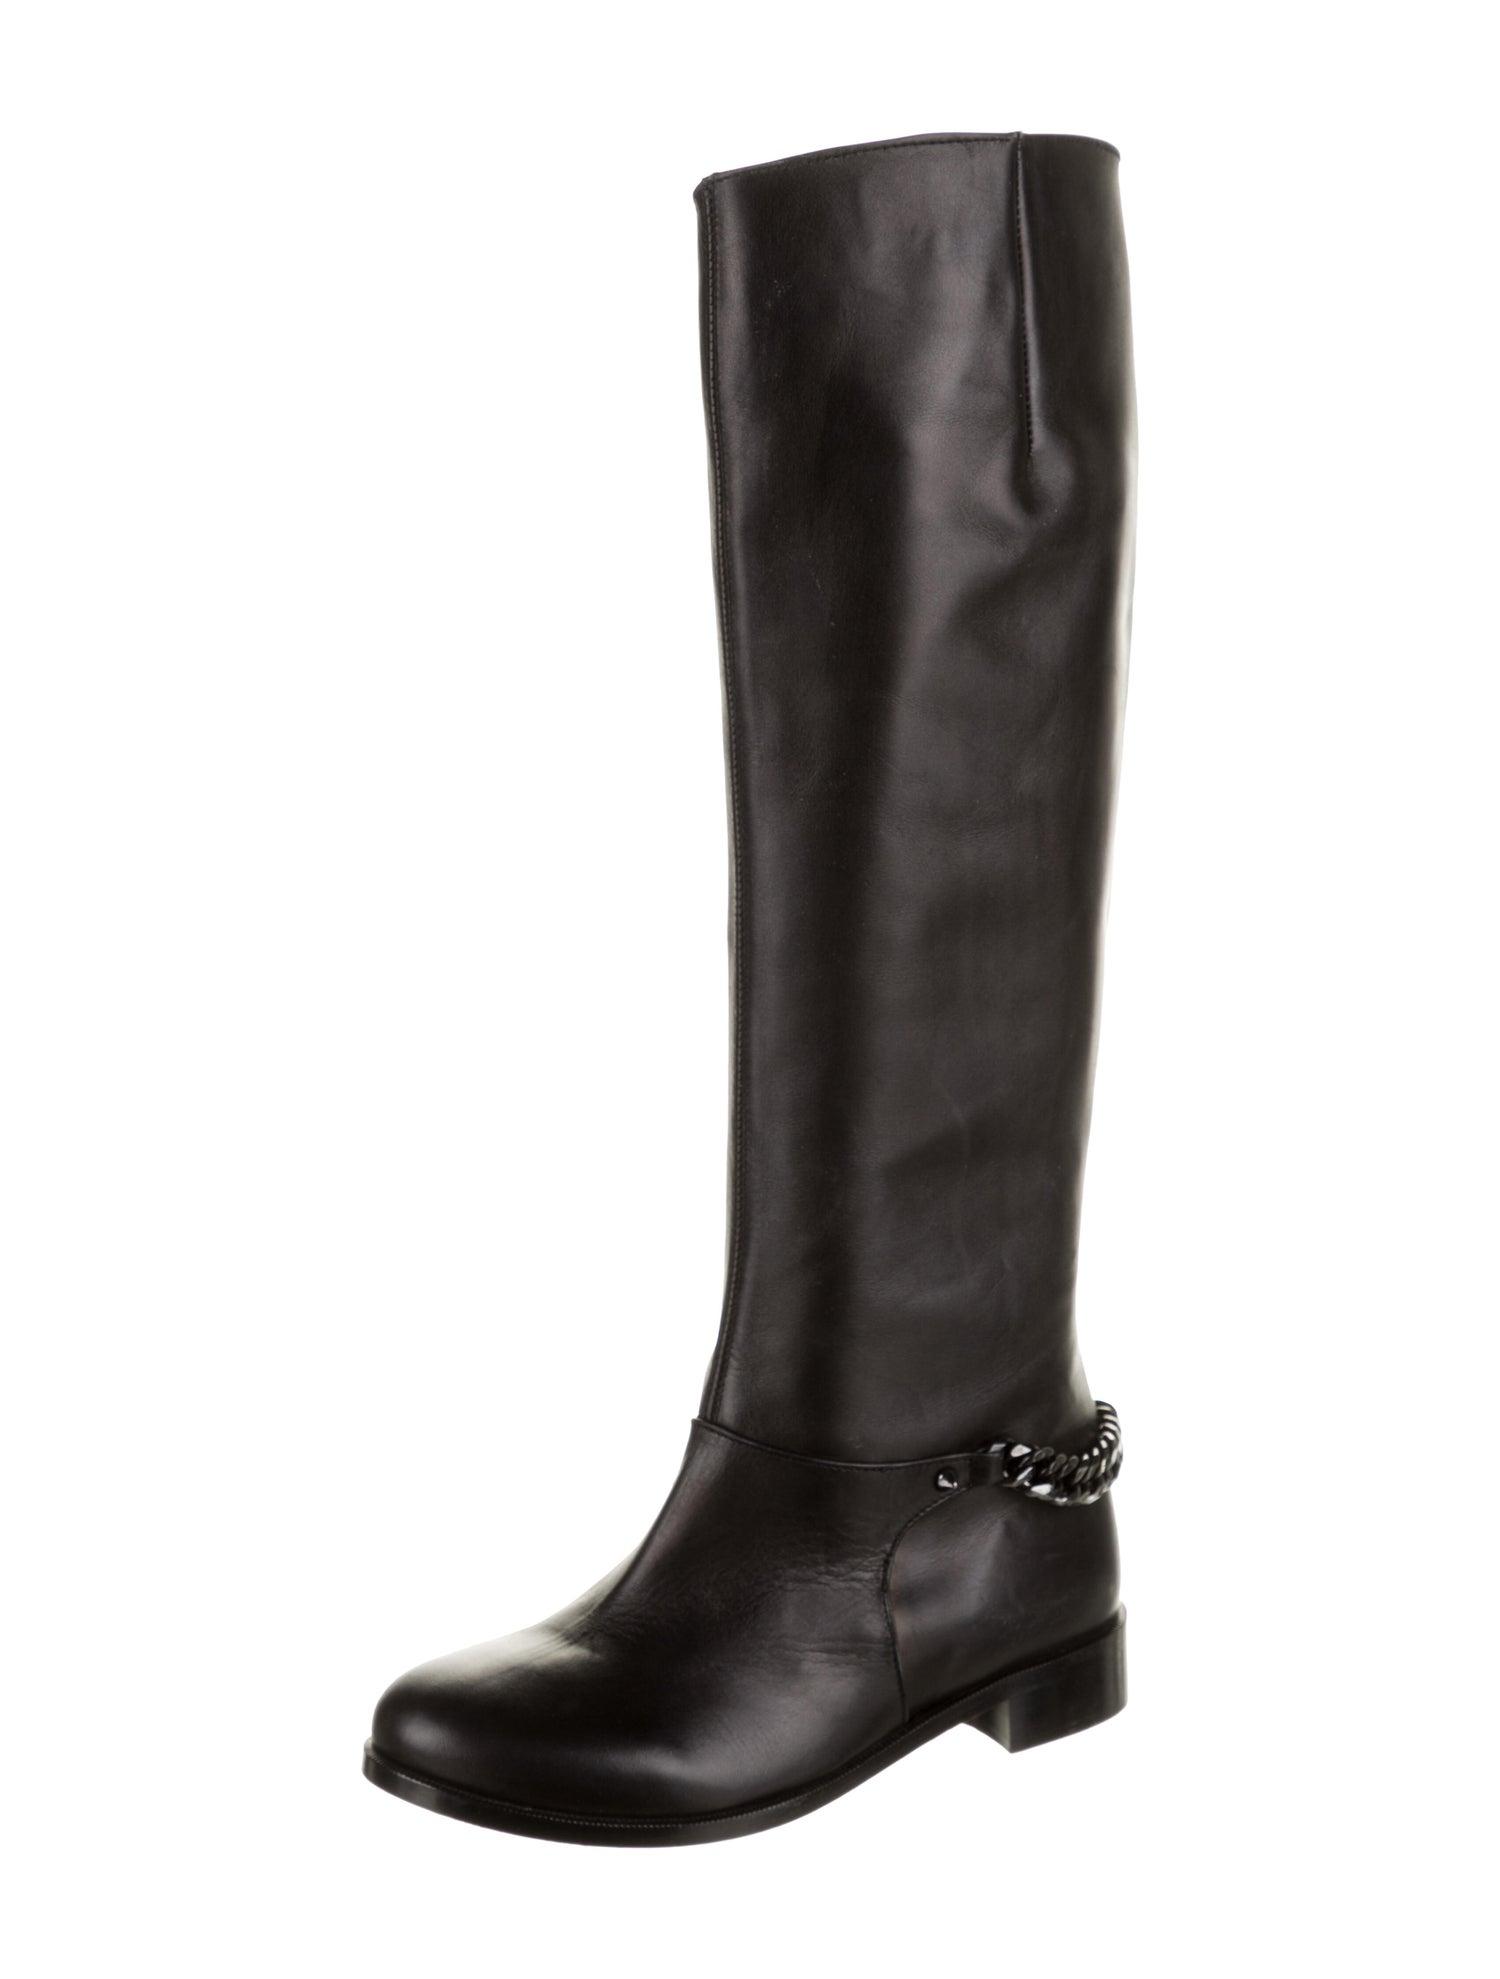 Christian-Louboutin-Cate-Leather-Knee-Boot-Chain-Detail-Sz-38.5-Shoe-Moto_16197B.jpg